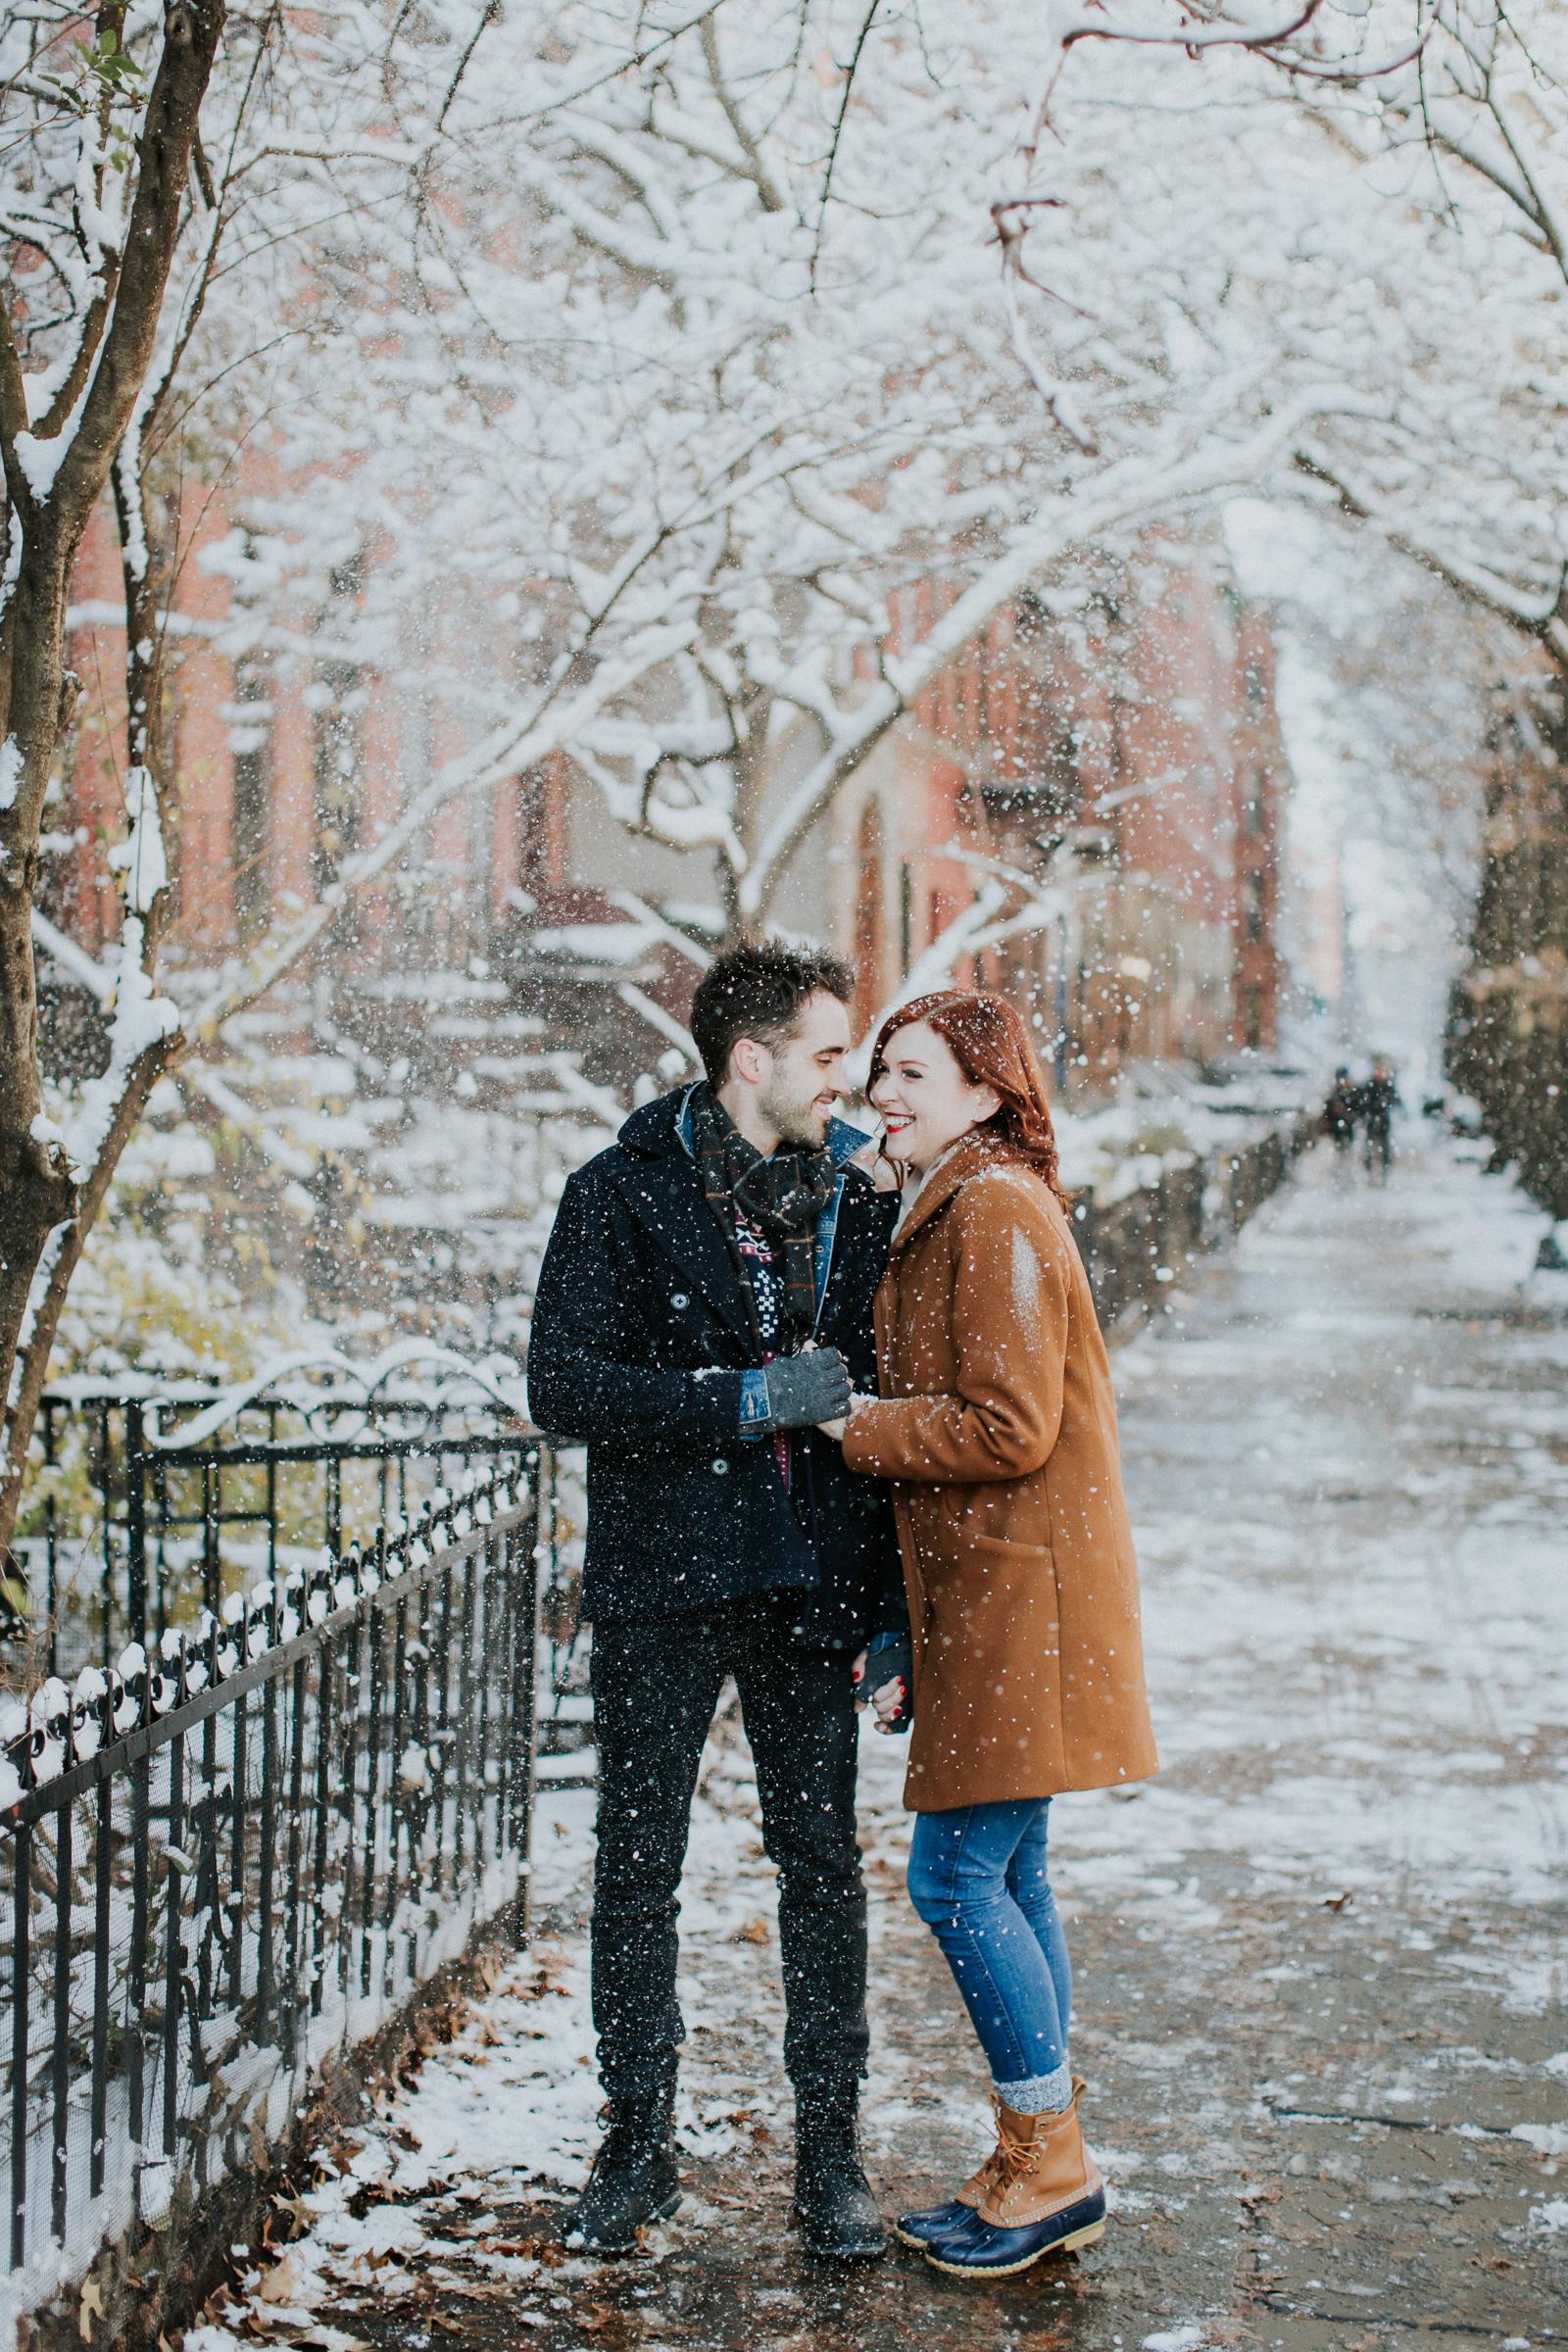 New-York-Documentary-Wedding-Photography-Best-Of-2017-by-Elvira-Kalviste-Photography-132.jpg